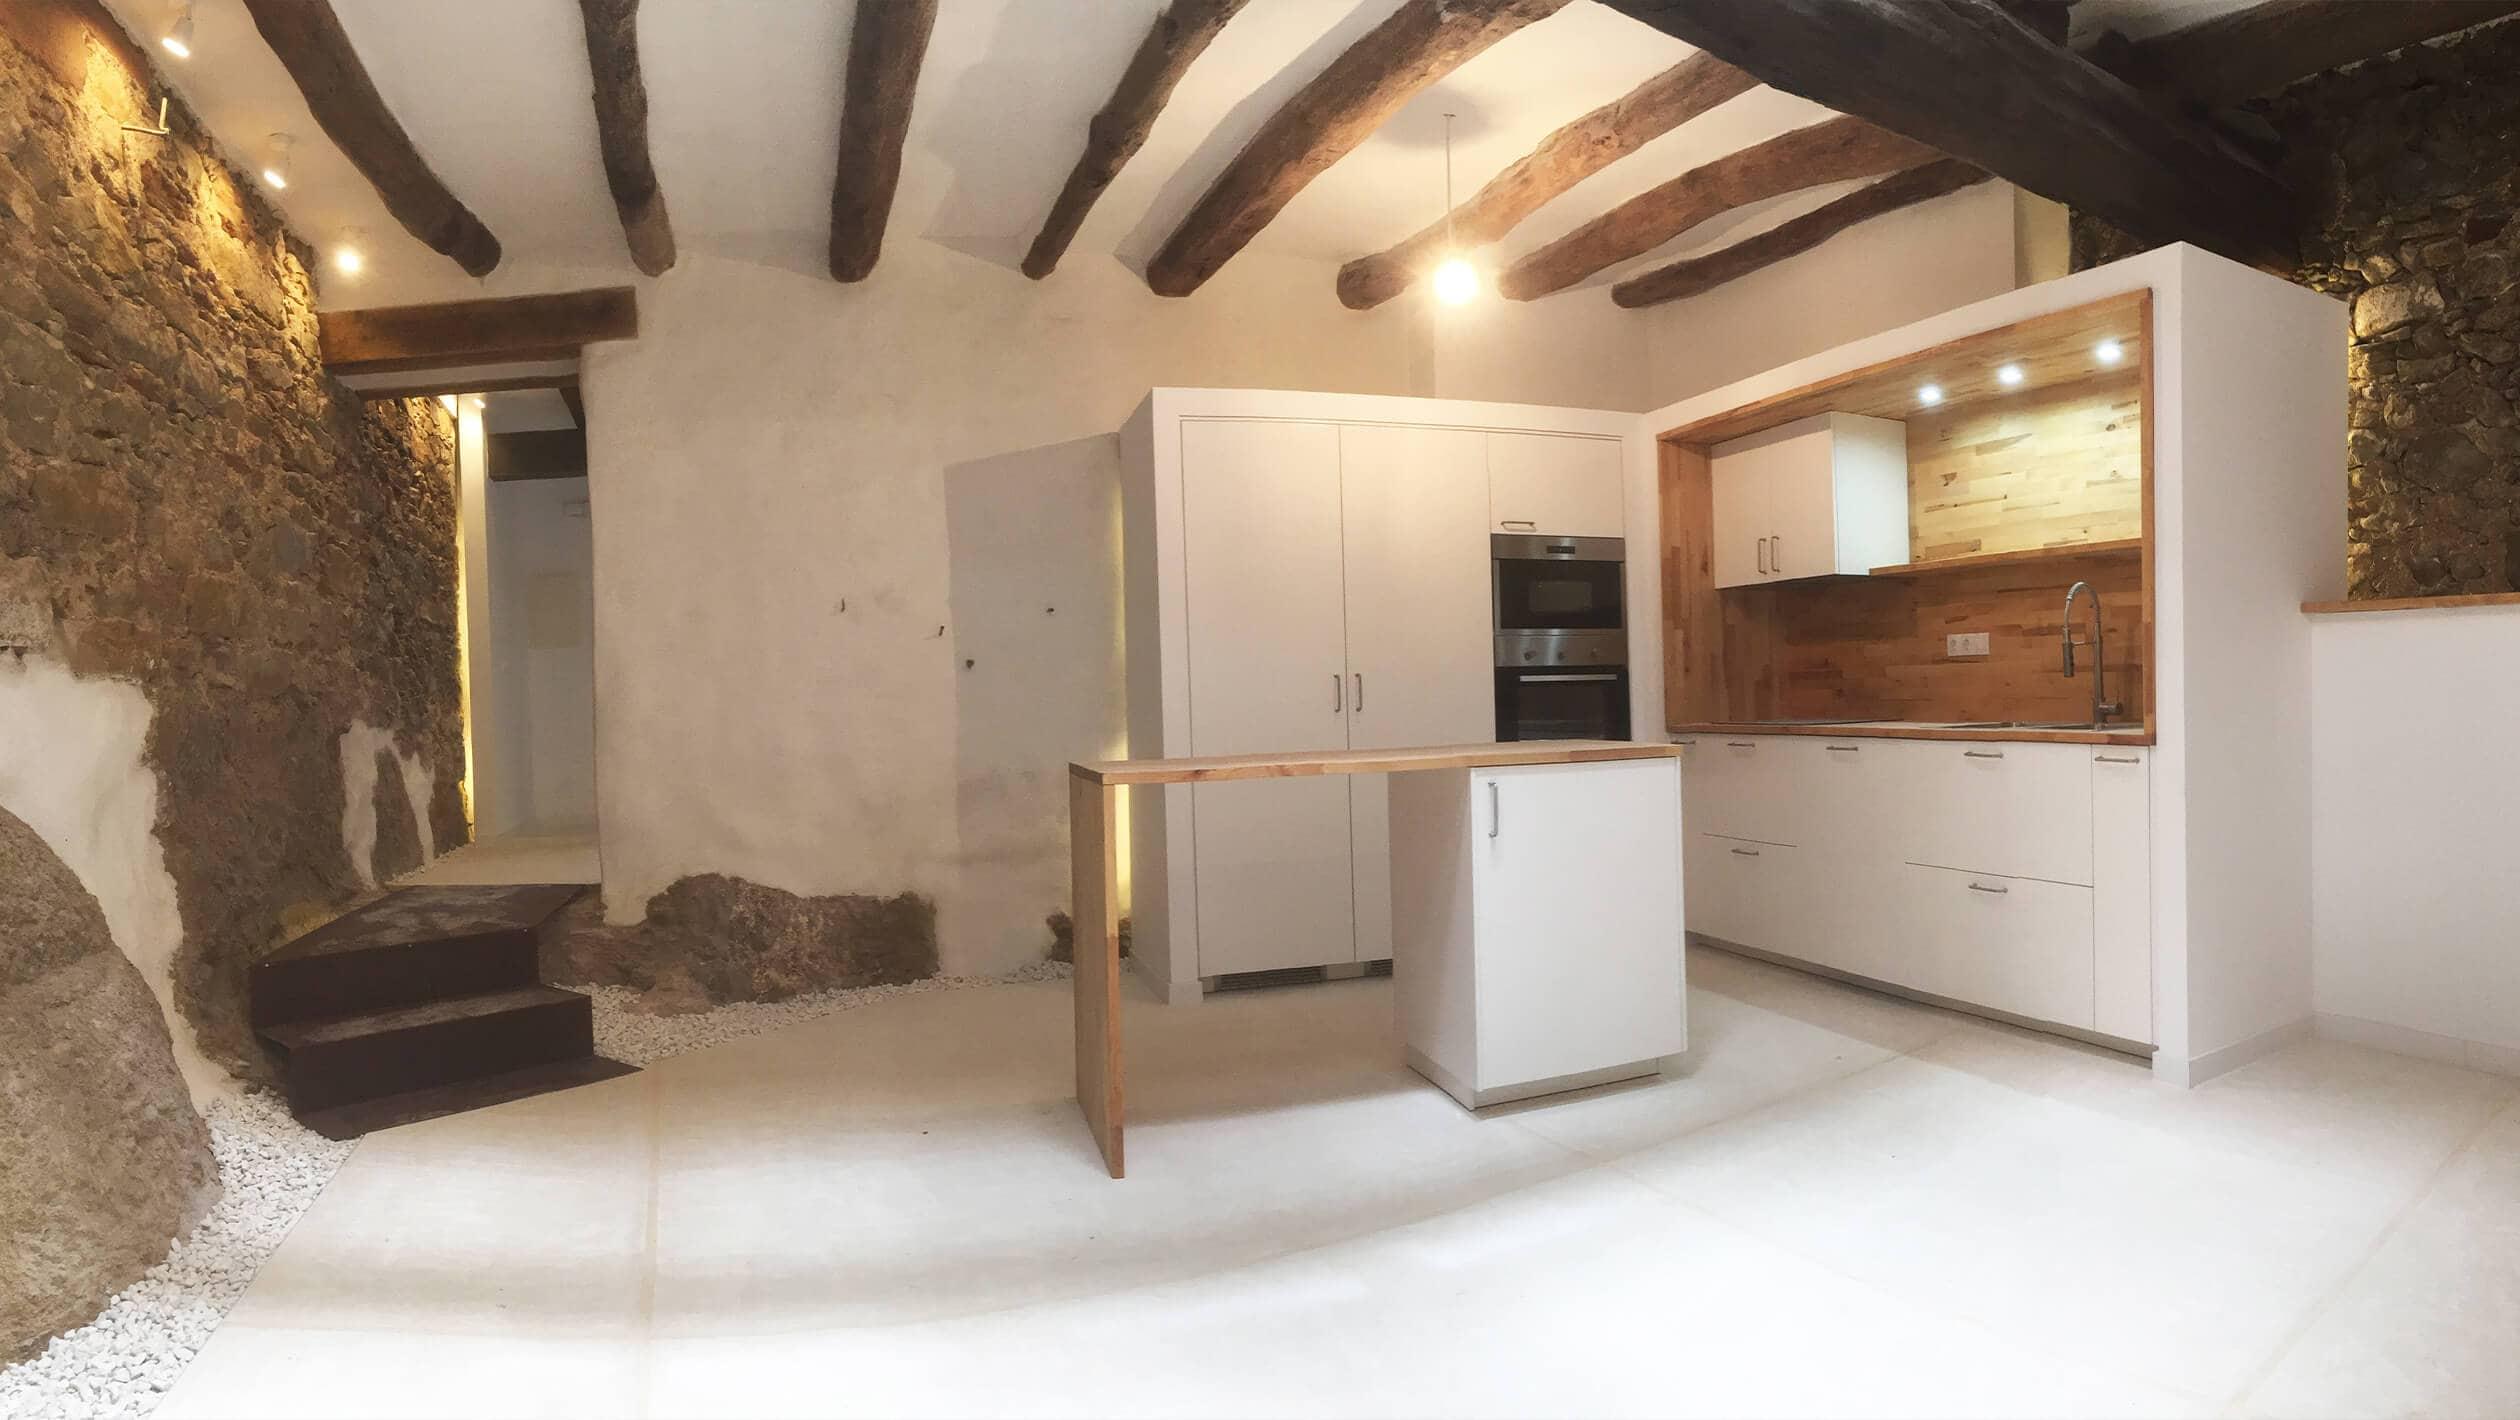 Reforma de vivienda del siglo XVIII | 2345 Arquitectes Barcelona